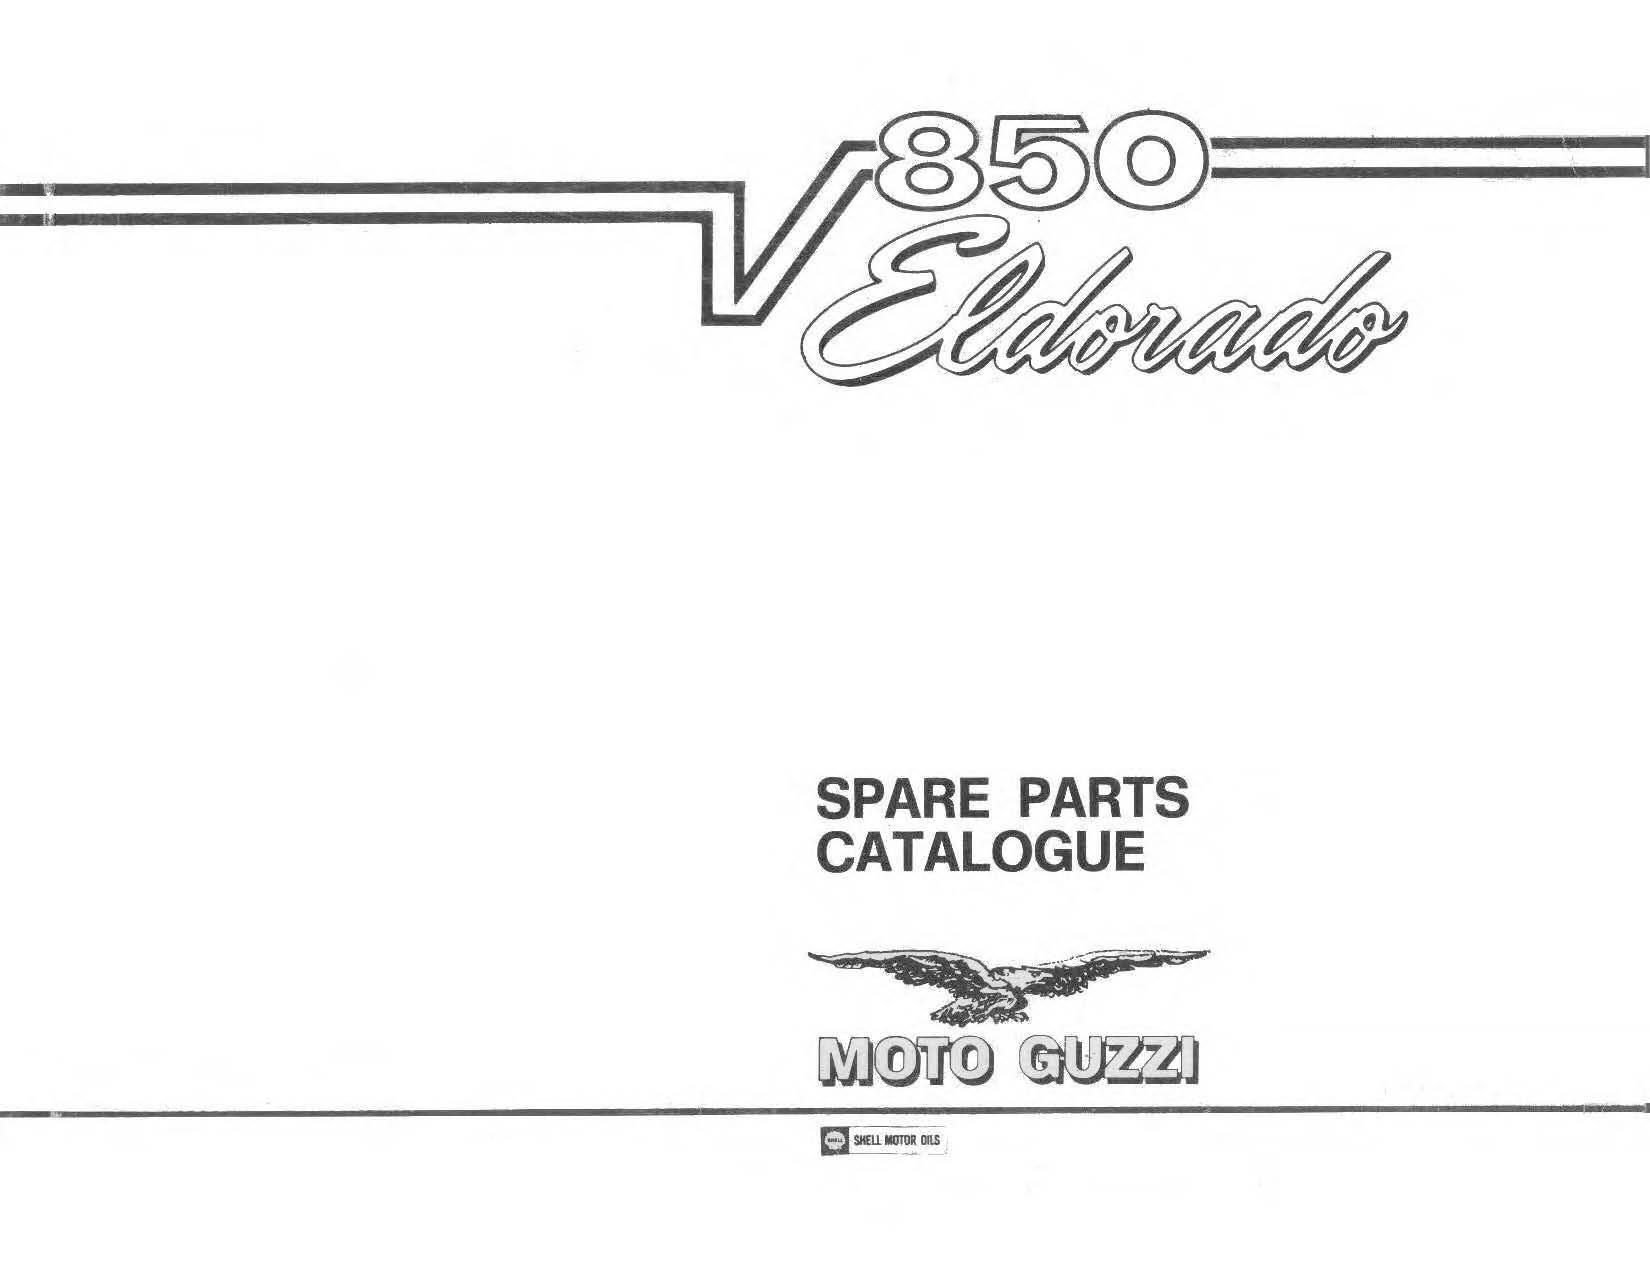 Moto Guzzi 850 Eldorado 1972 Parts List PDF Download